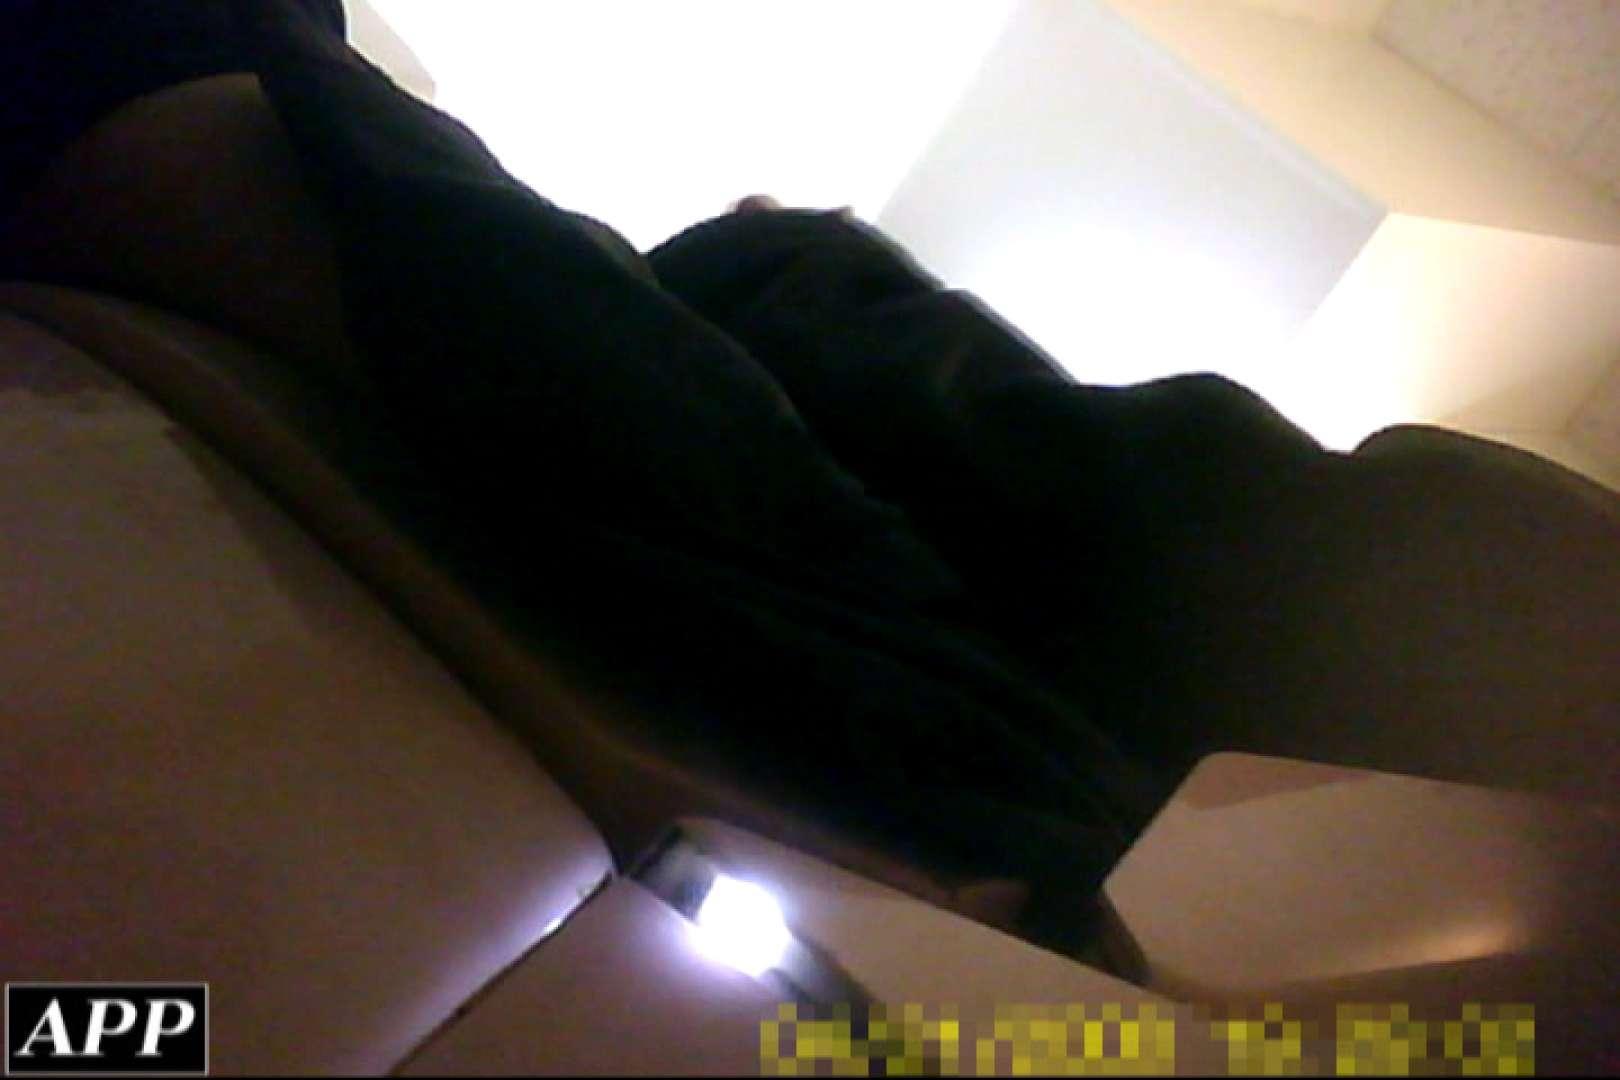 3視点洗面所 vol.57 OLハメ撮り  76Pix 48